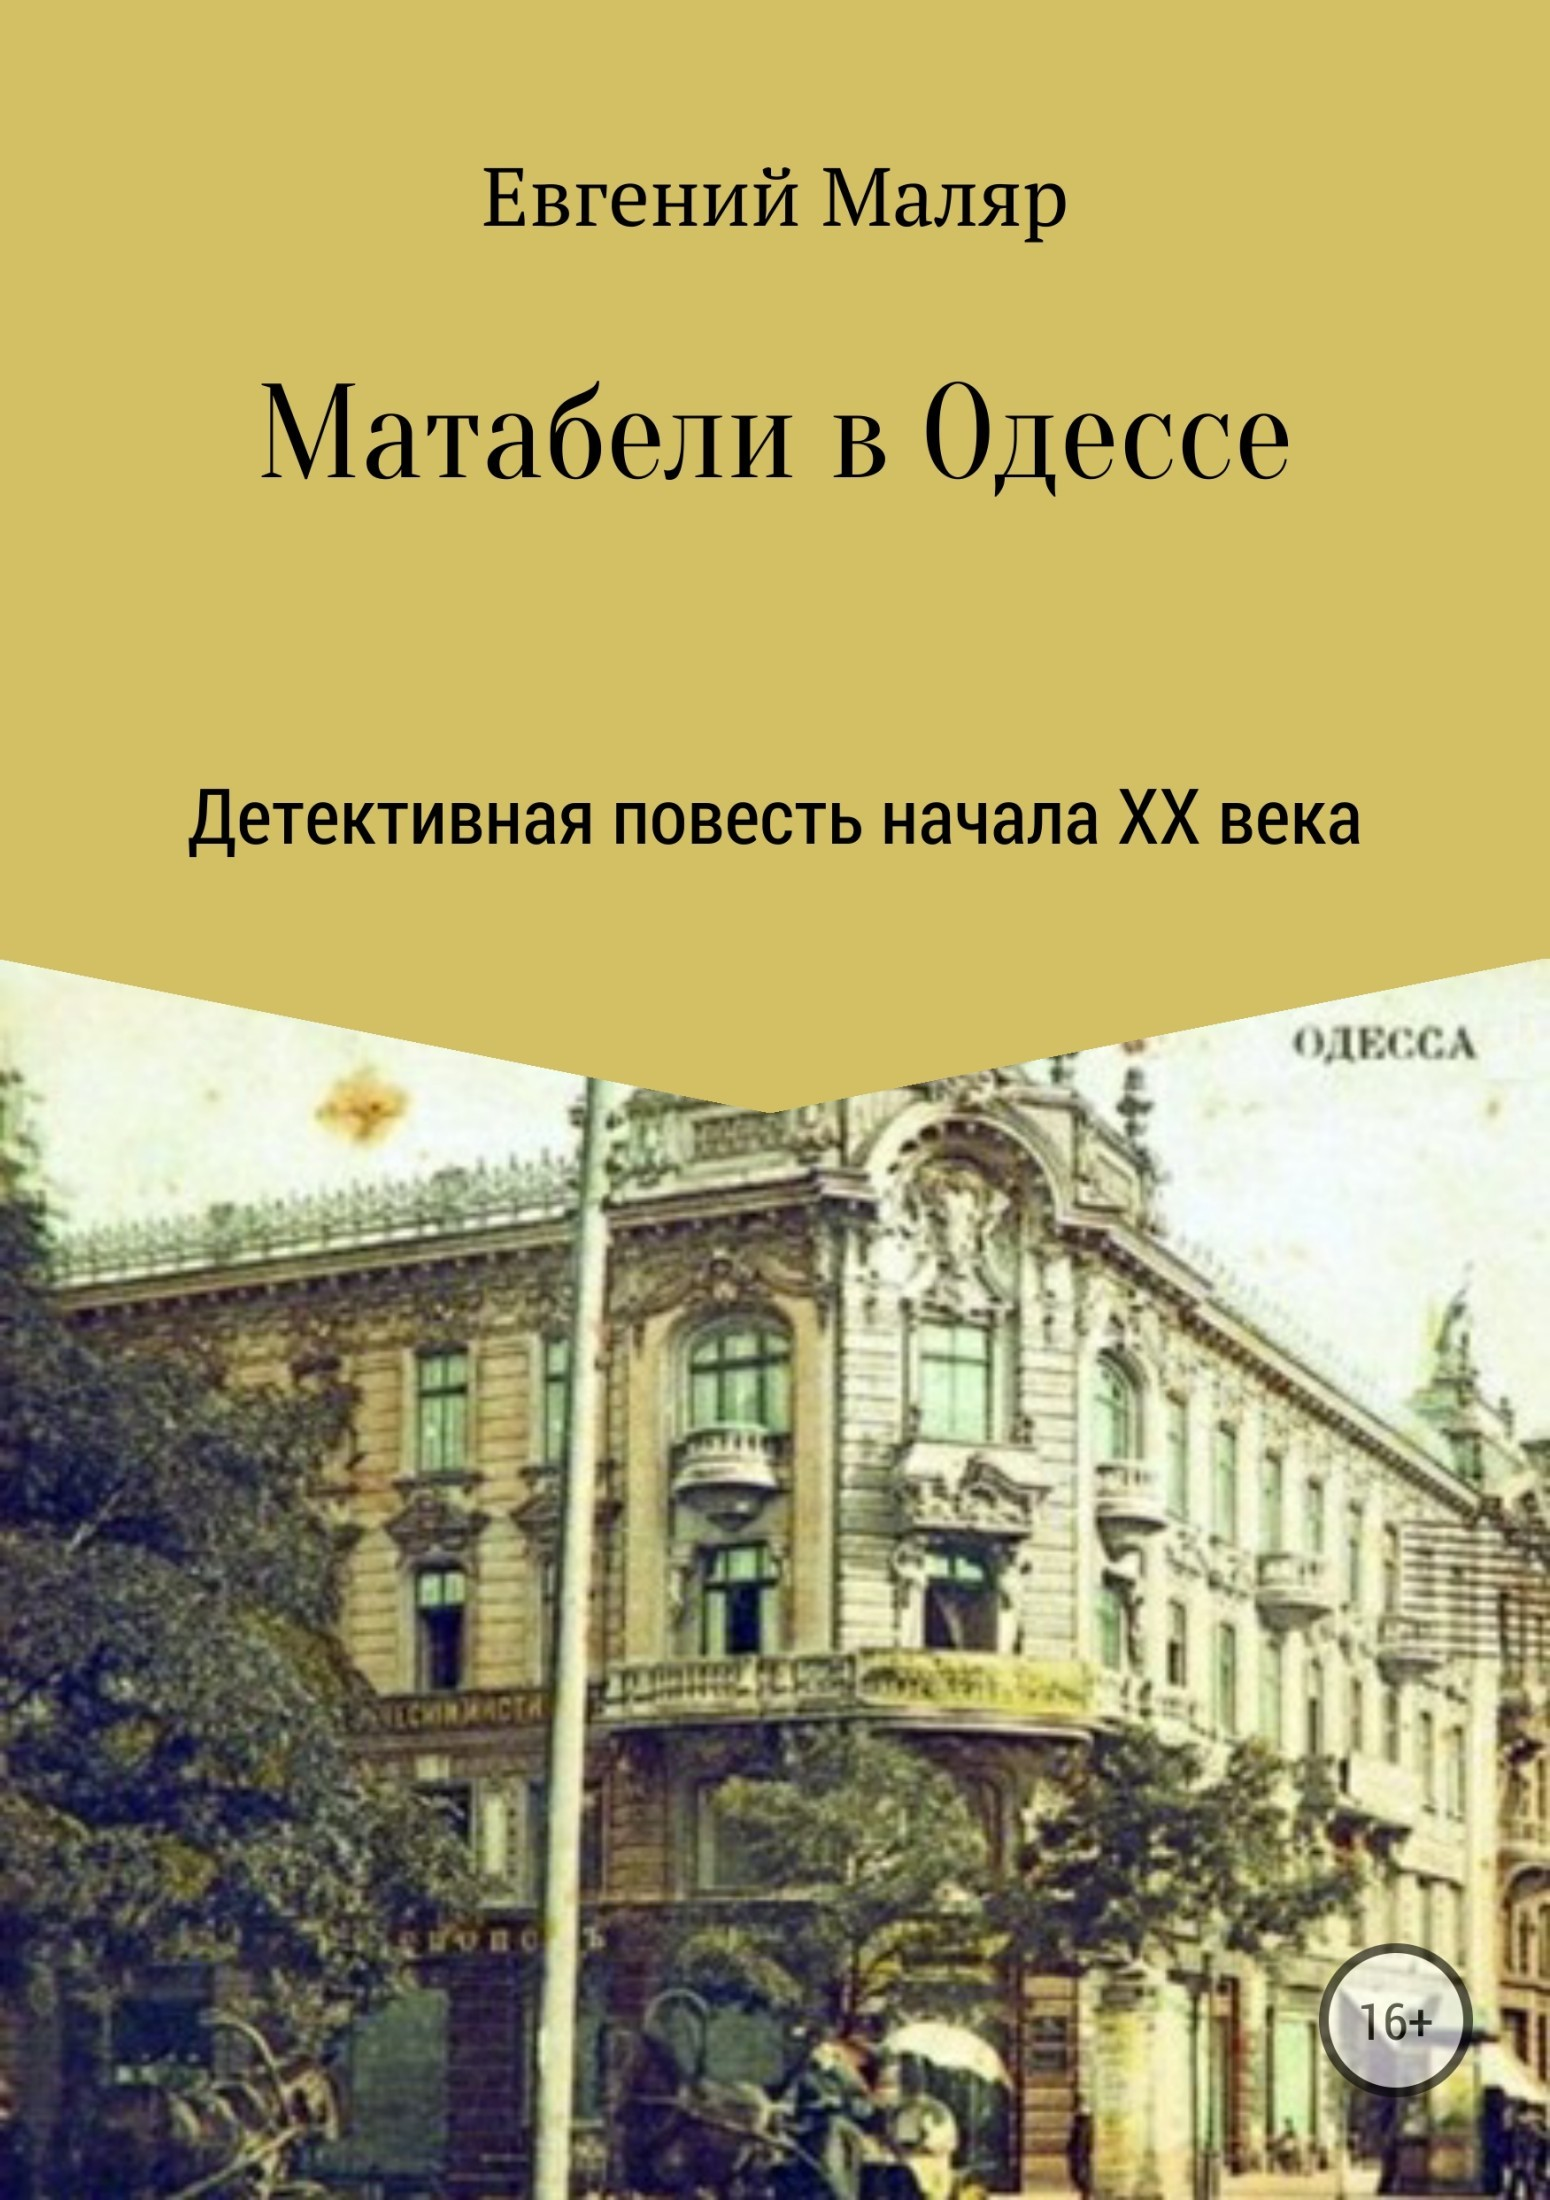 Егений Атольеич Маляр Матабели